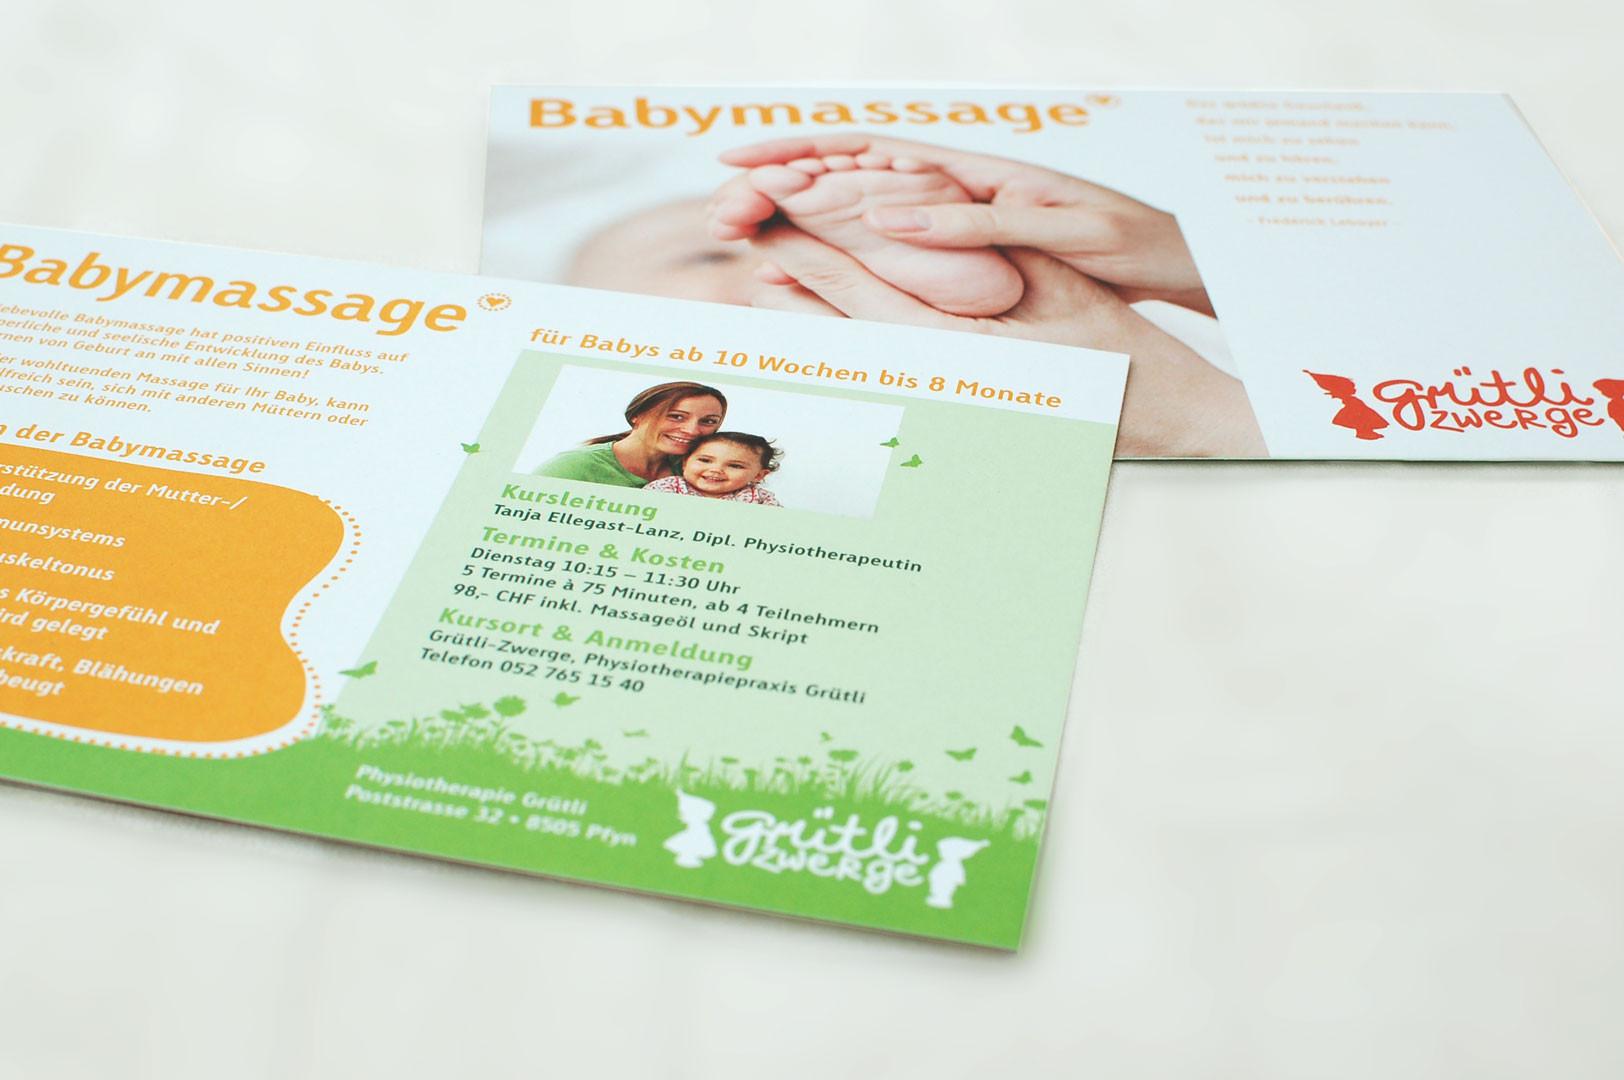 gruetli_flyer_babymassage.jpg